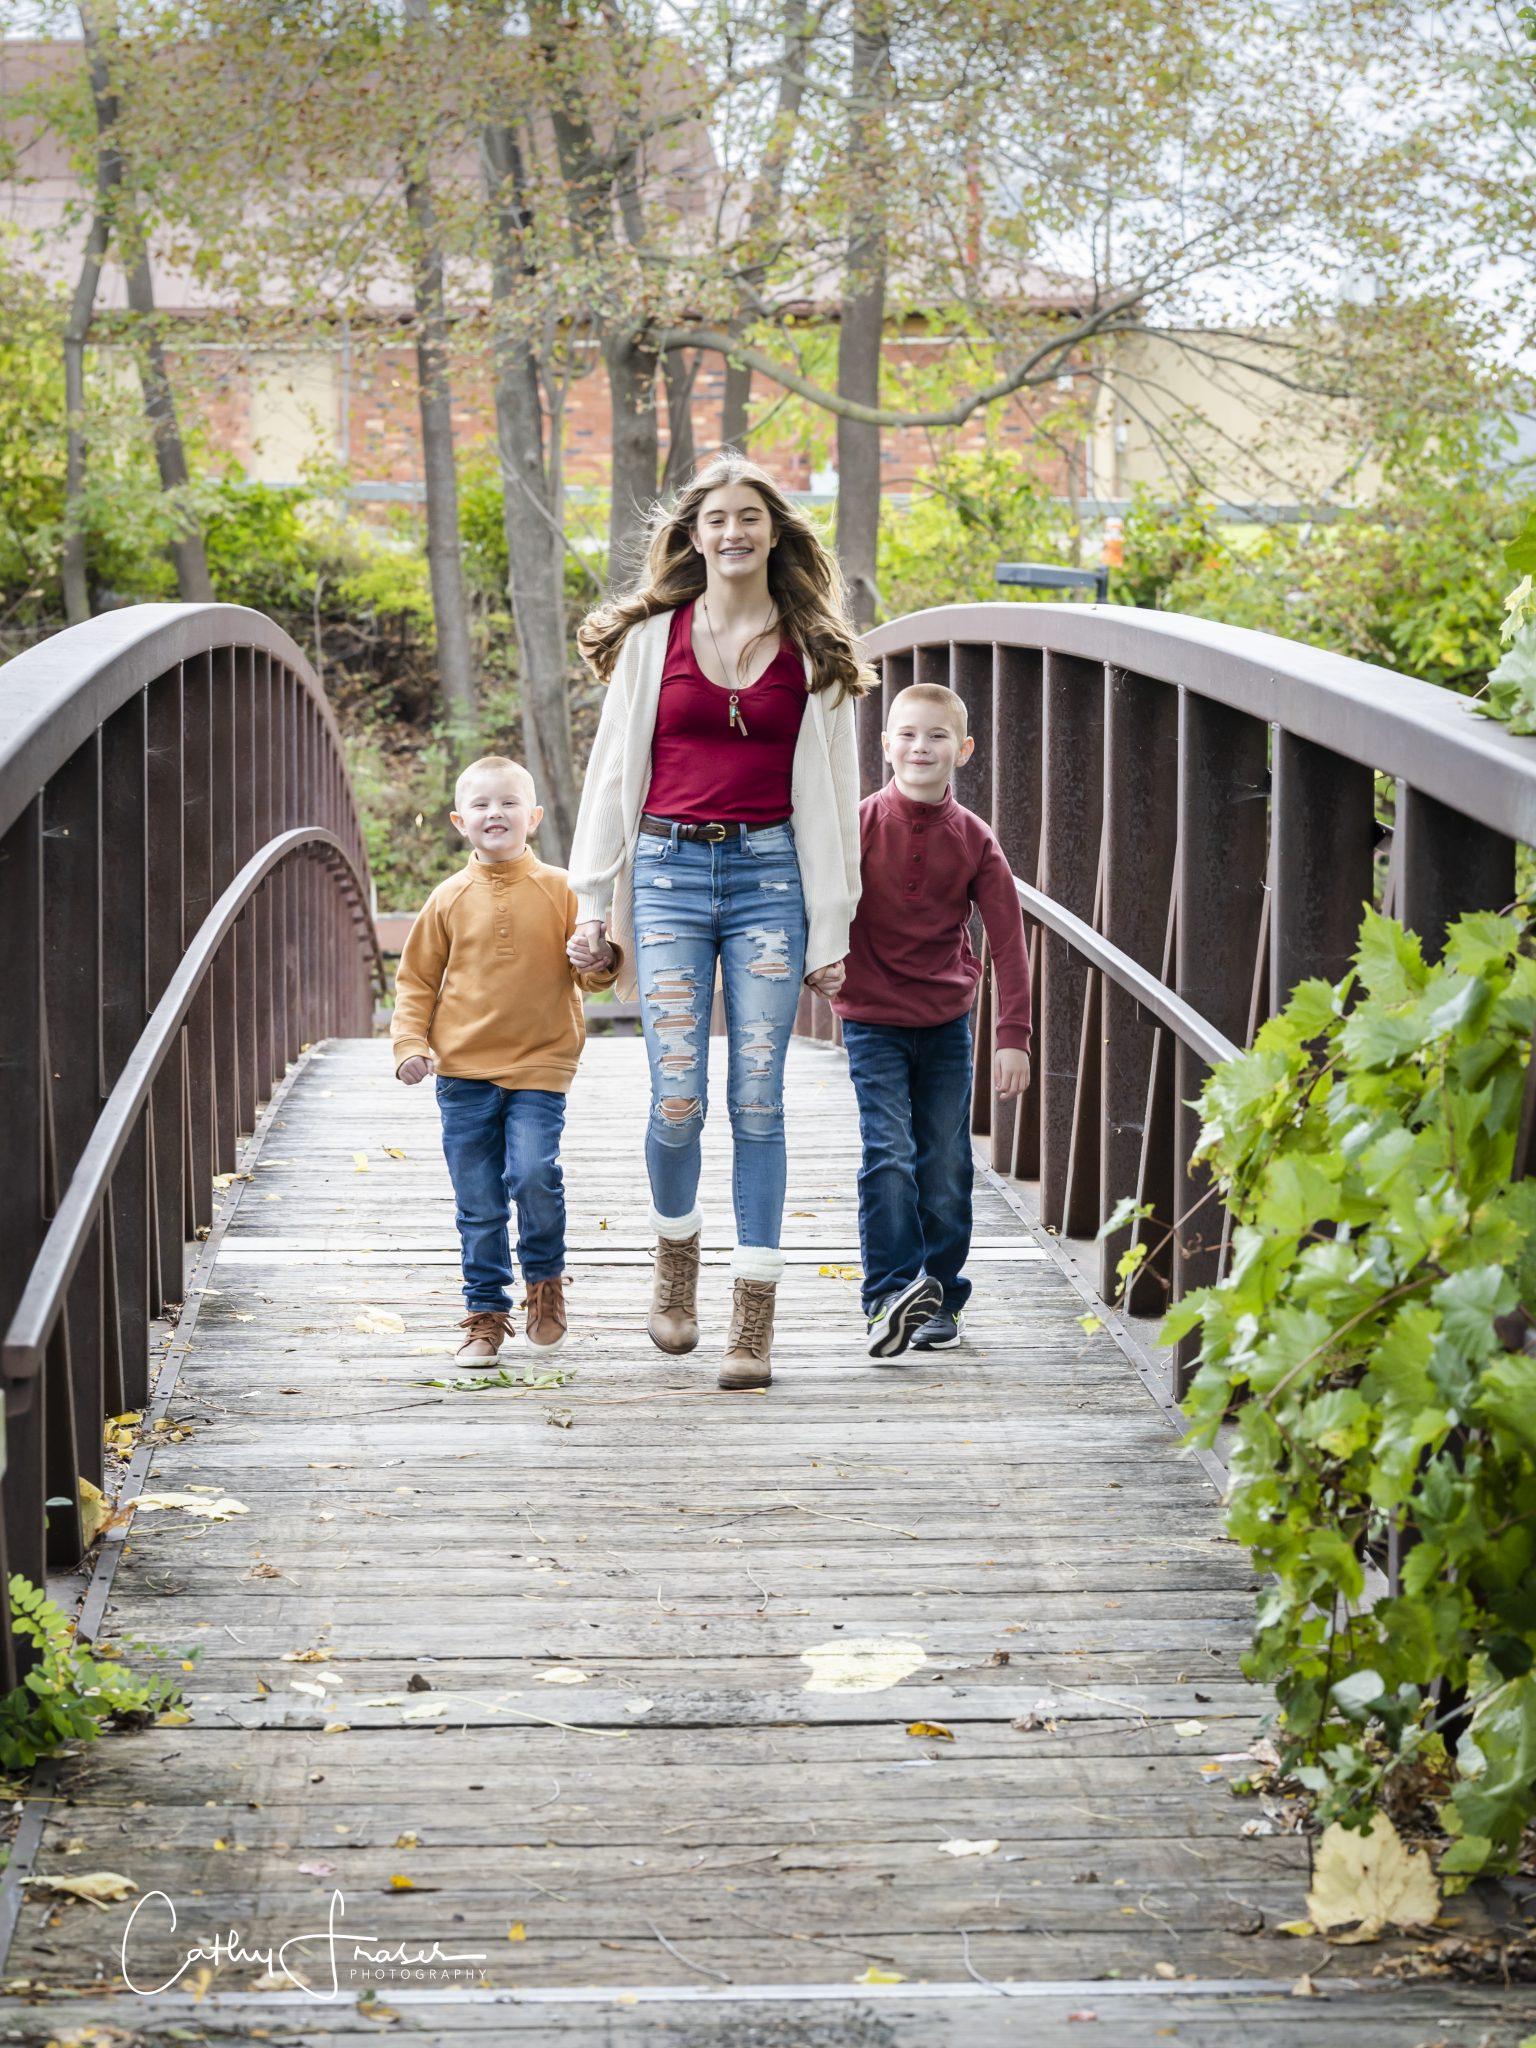 Penn Yan, New York, natural light, siblings walking on footbridge, children in jeans, sweaters